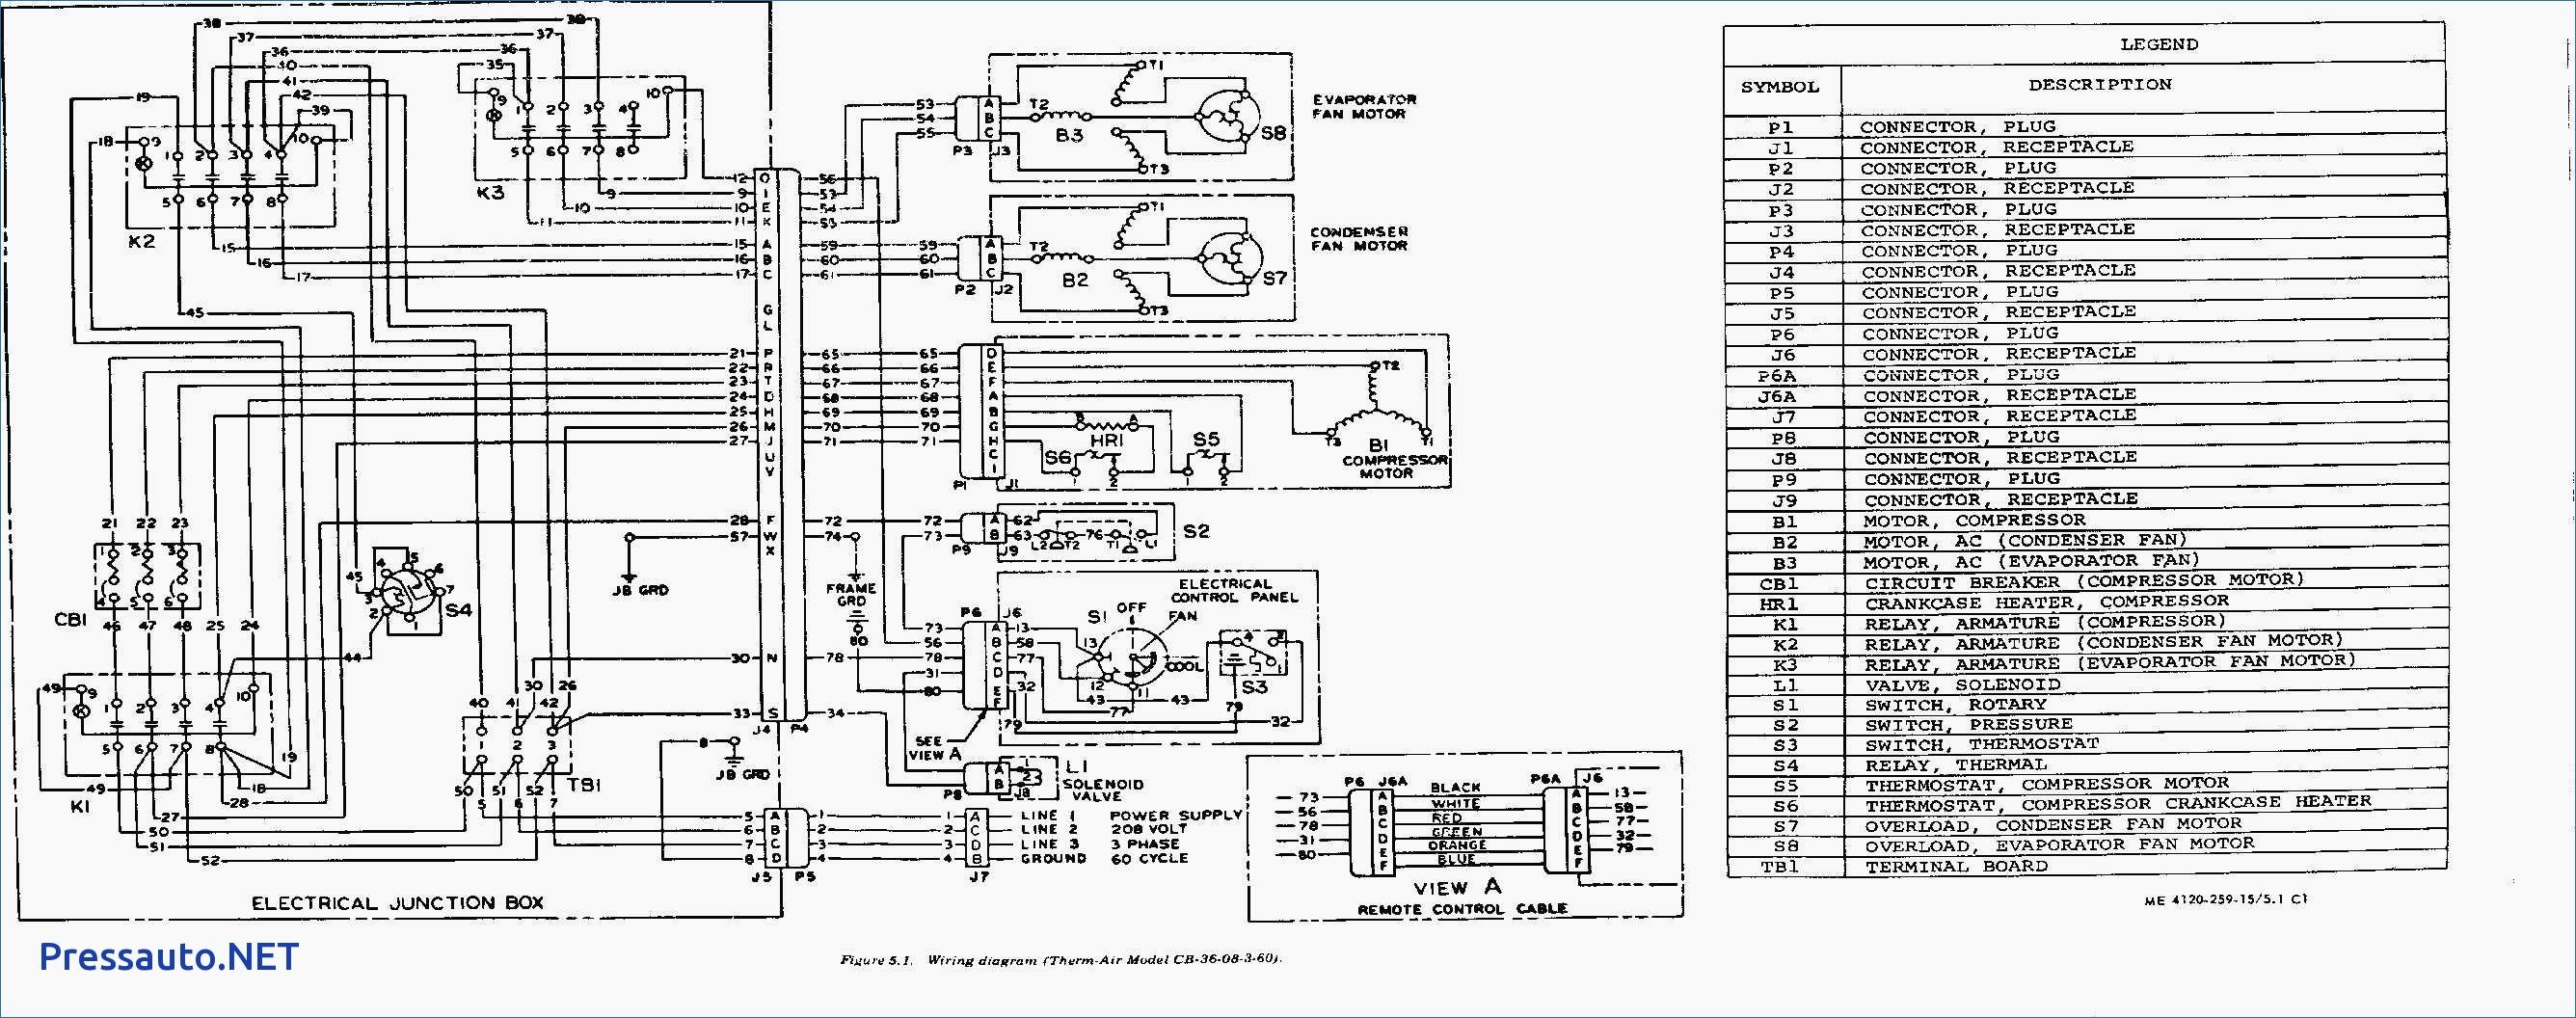 Curtis Controller Wiring Diagram 48 Volt Golf Cart | Manual E-Books - 48 Volt Golf Cart Wiring Diagram